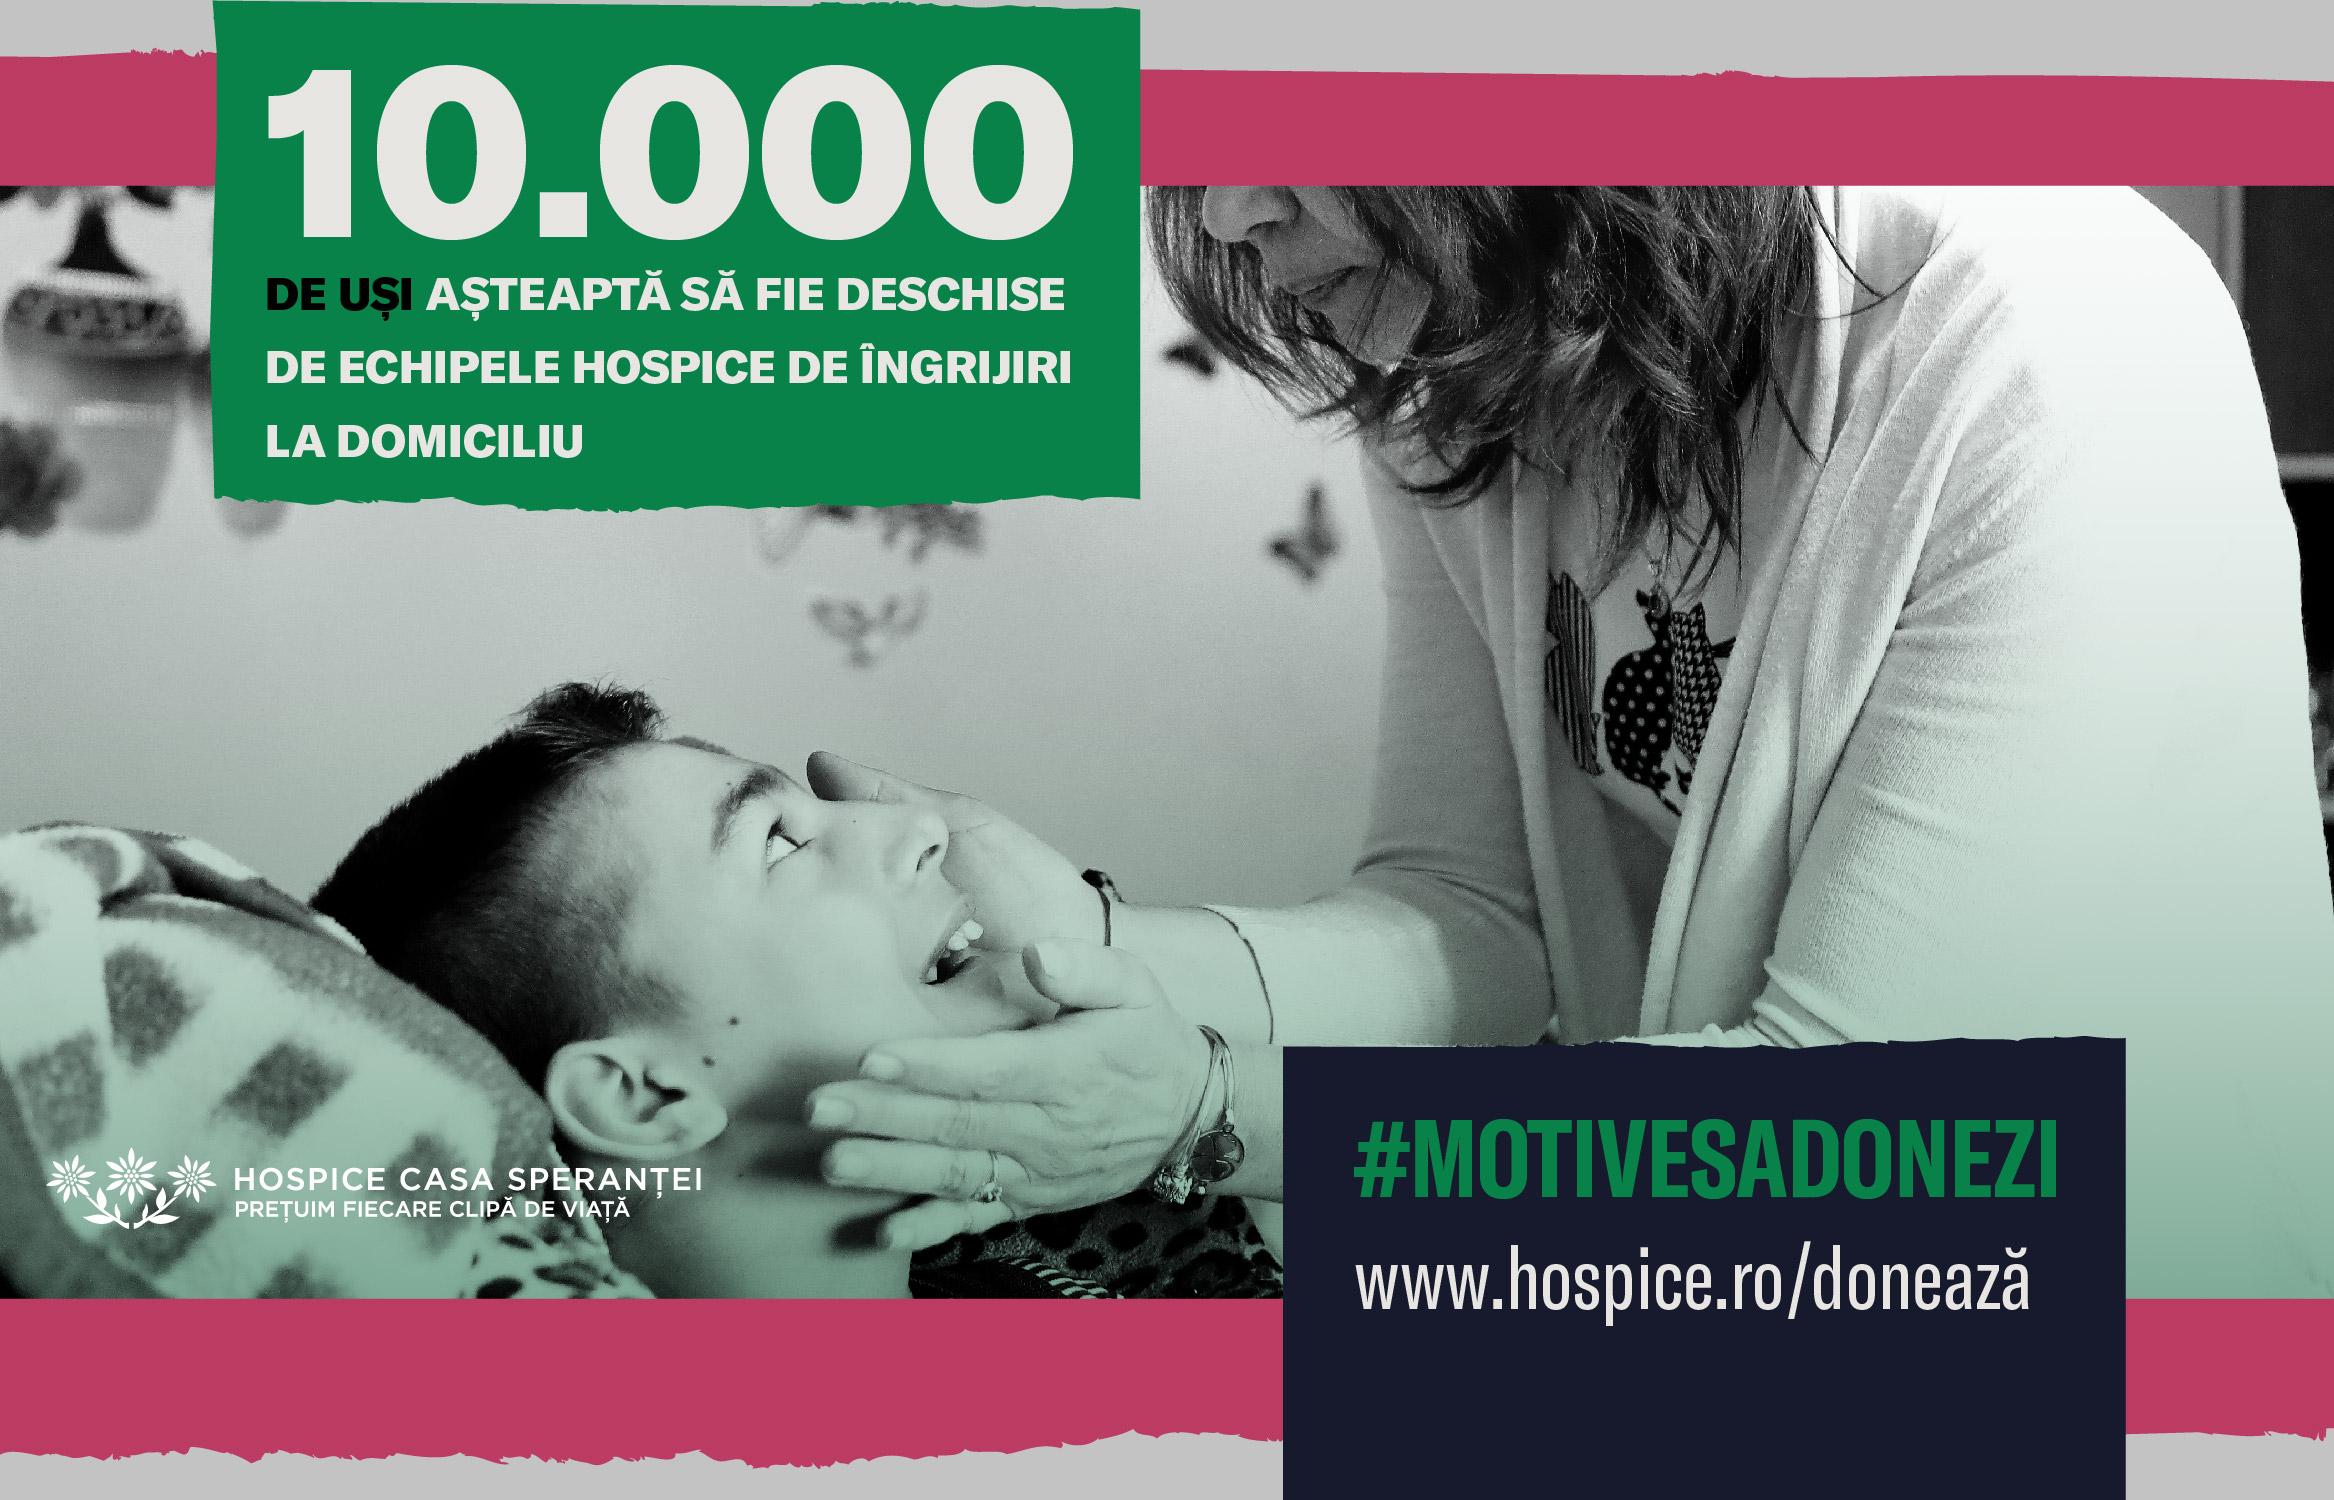 #motivesadonezi